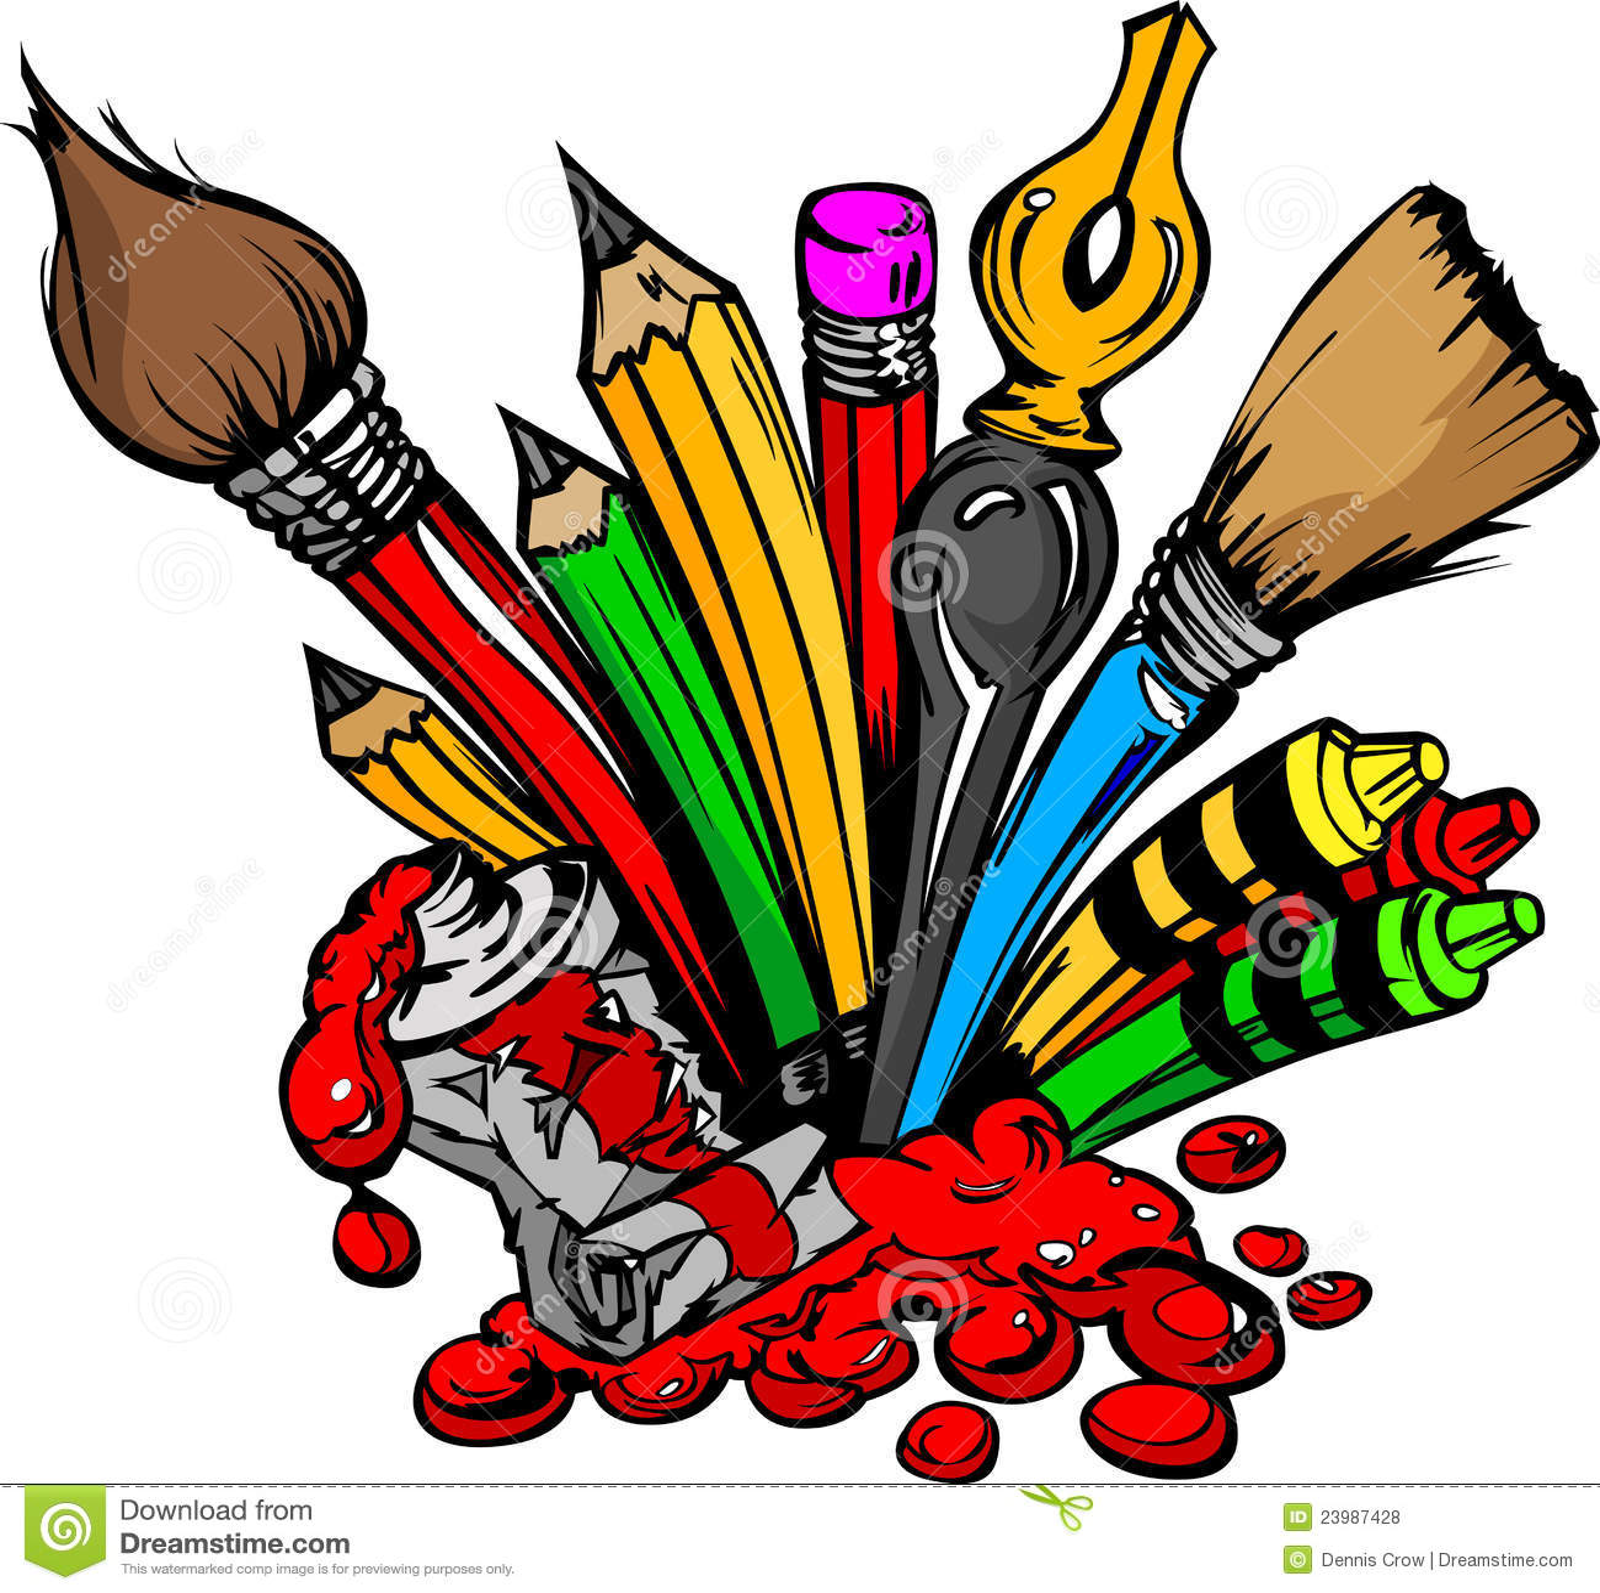 cartoon image of art